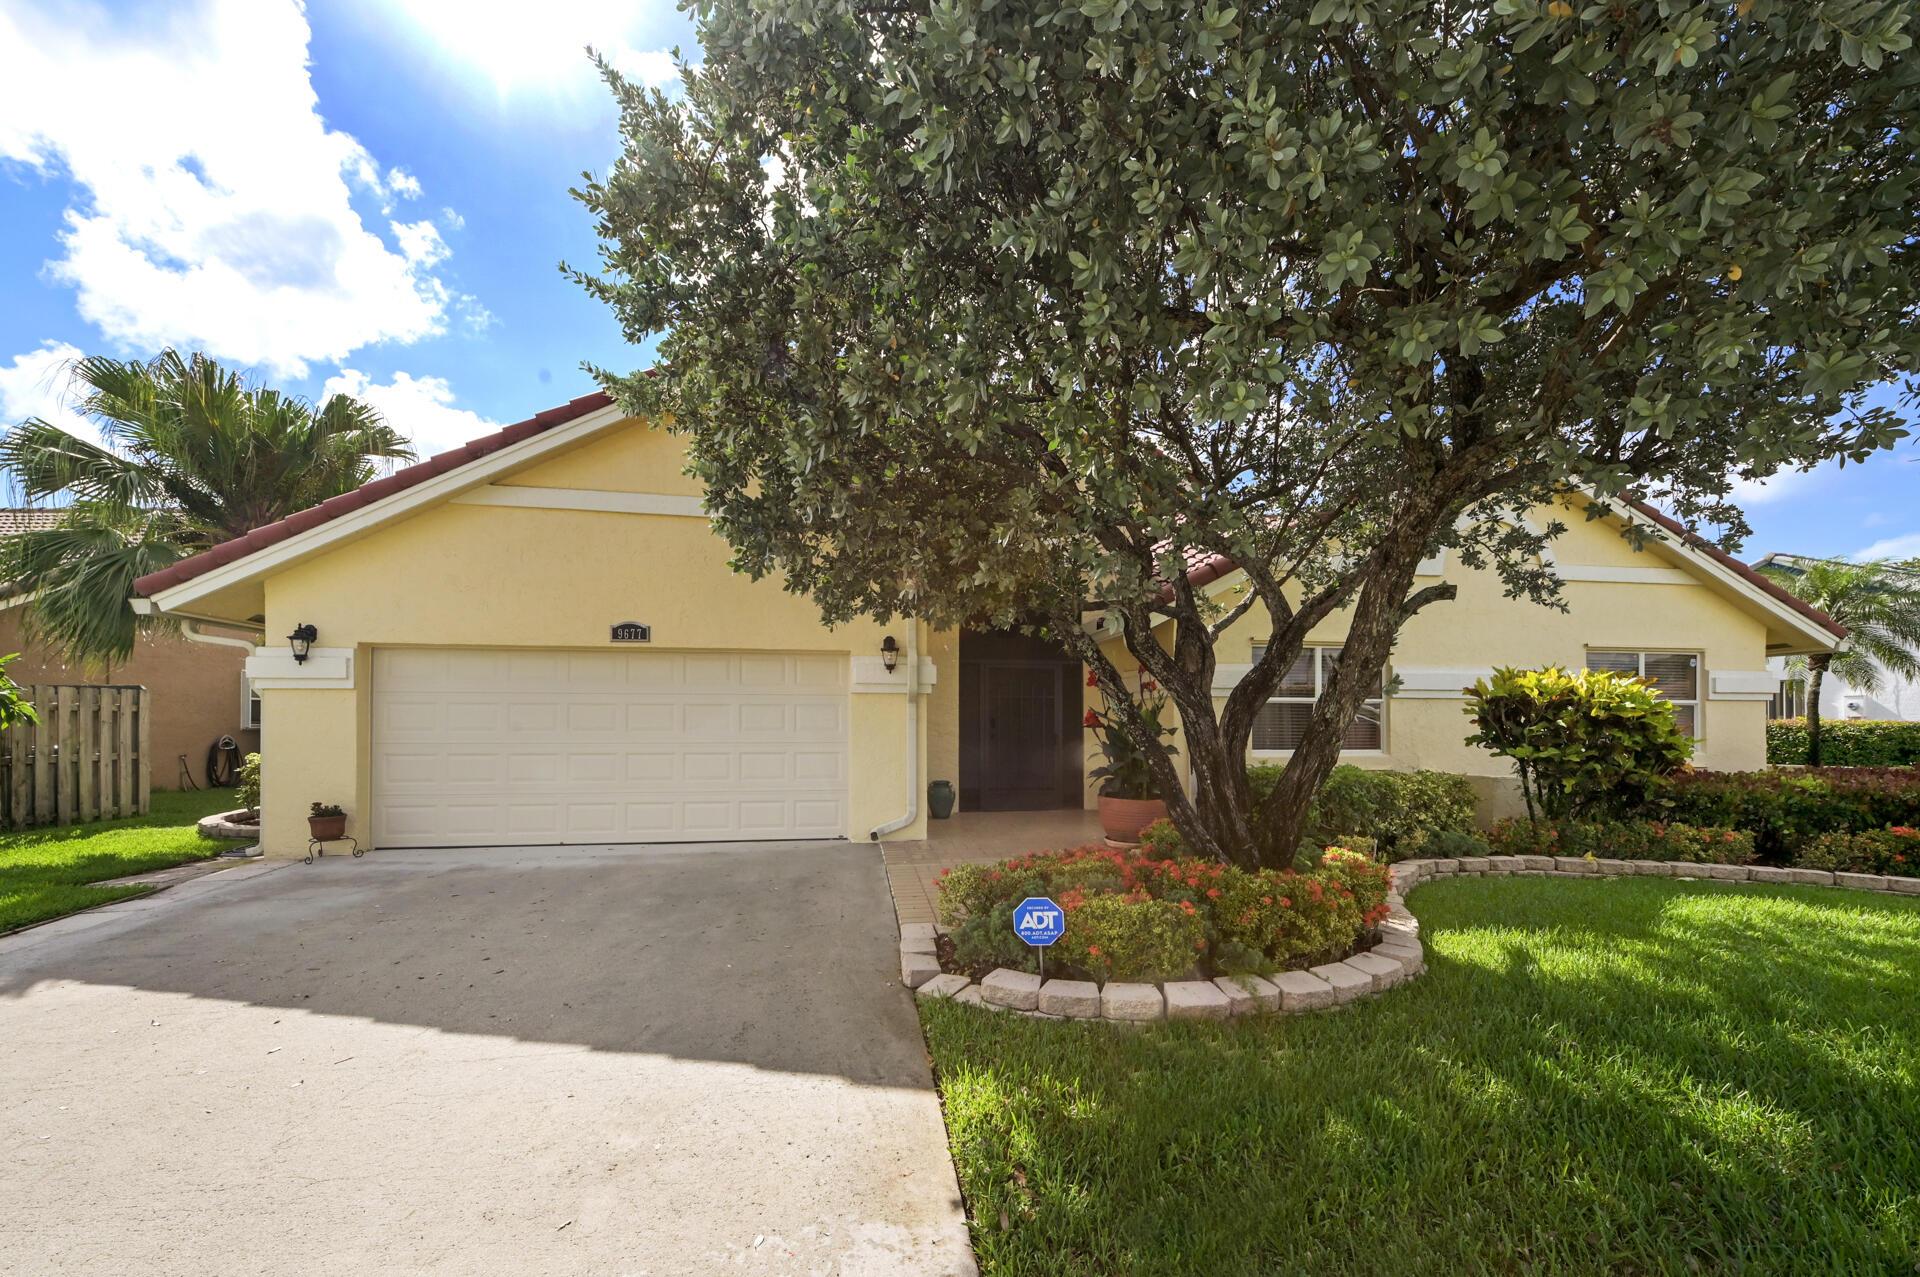 9677 El Clair Ranch Rd Boynton Beach, FL 33437